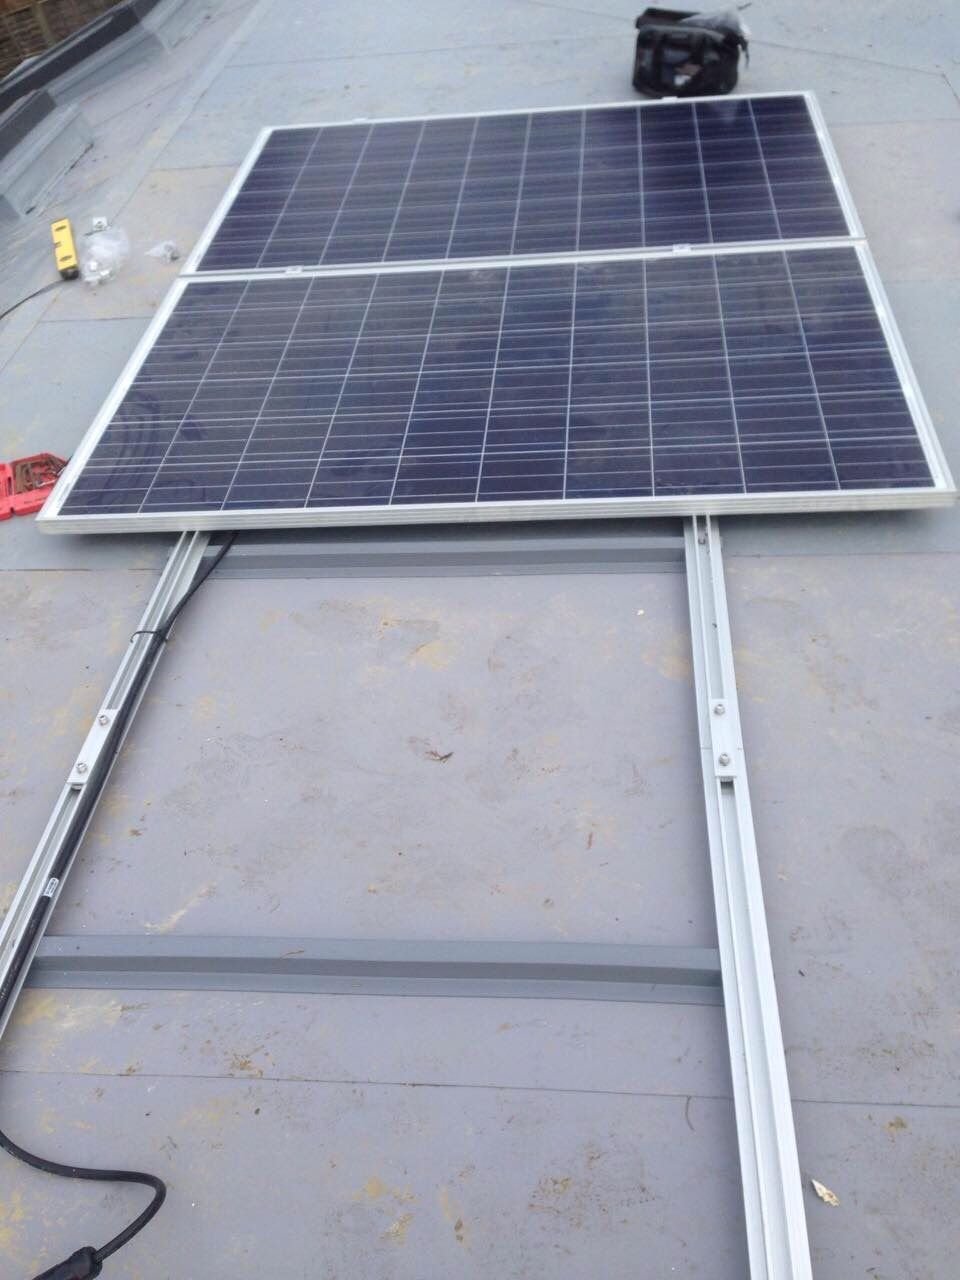 Solar Panels On Edpm Rubber Flat Roof Solar Panels Rubber Flat Roof Pv Panels